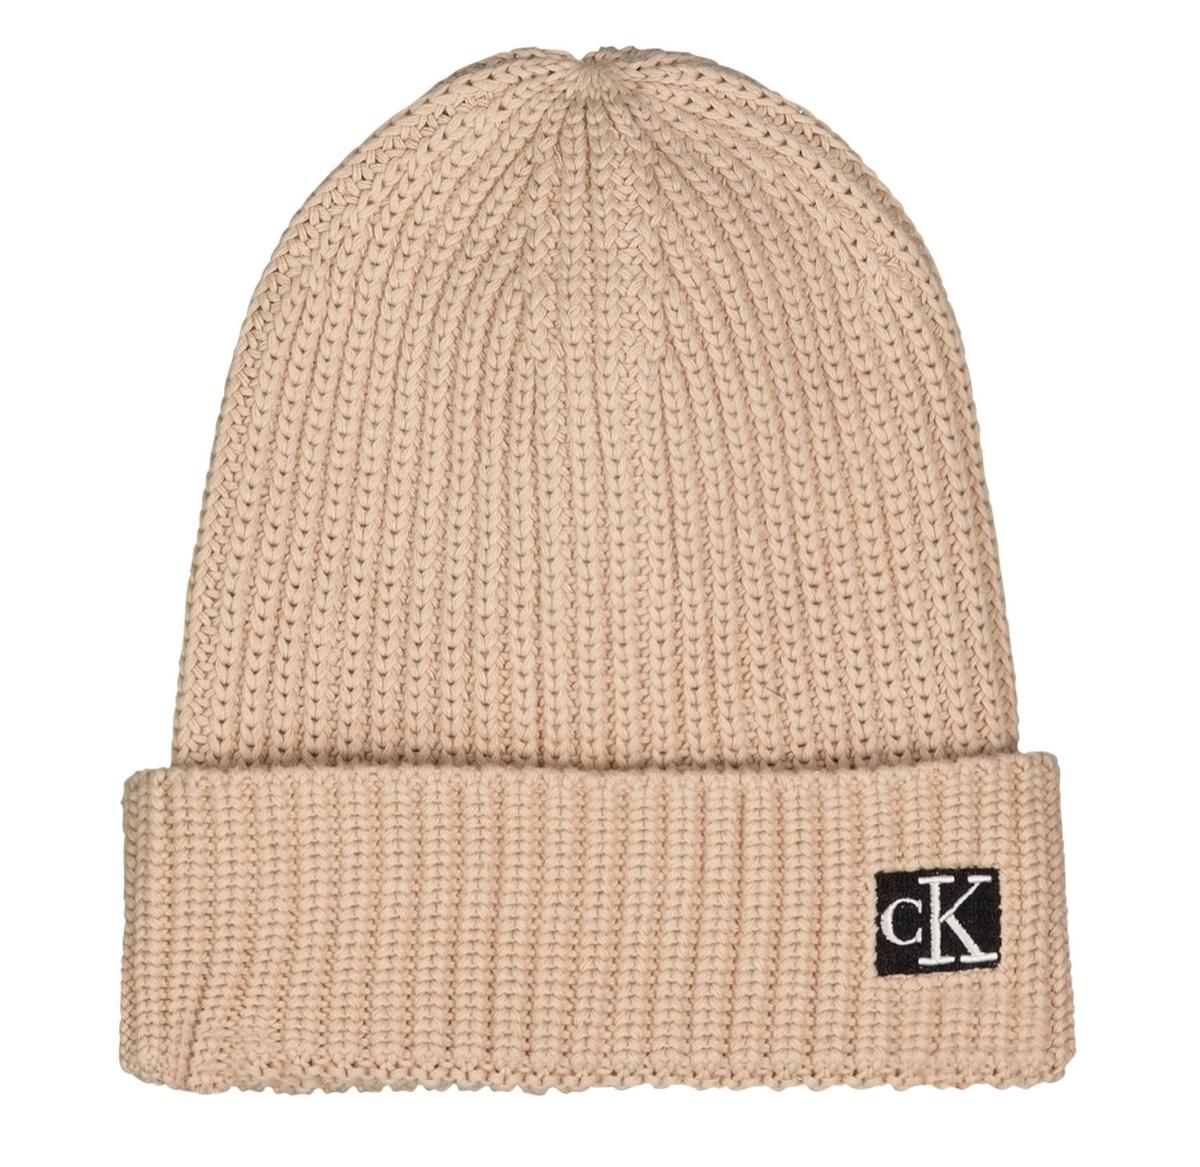 CK כובע סריג בז